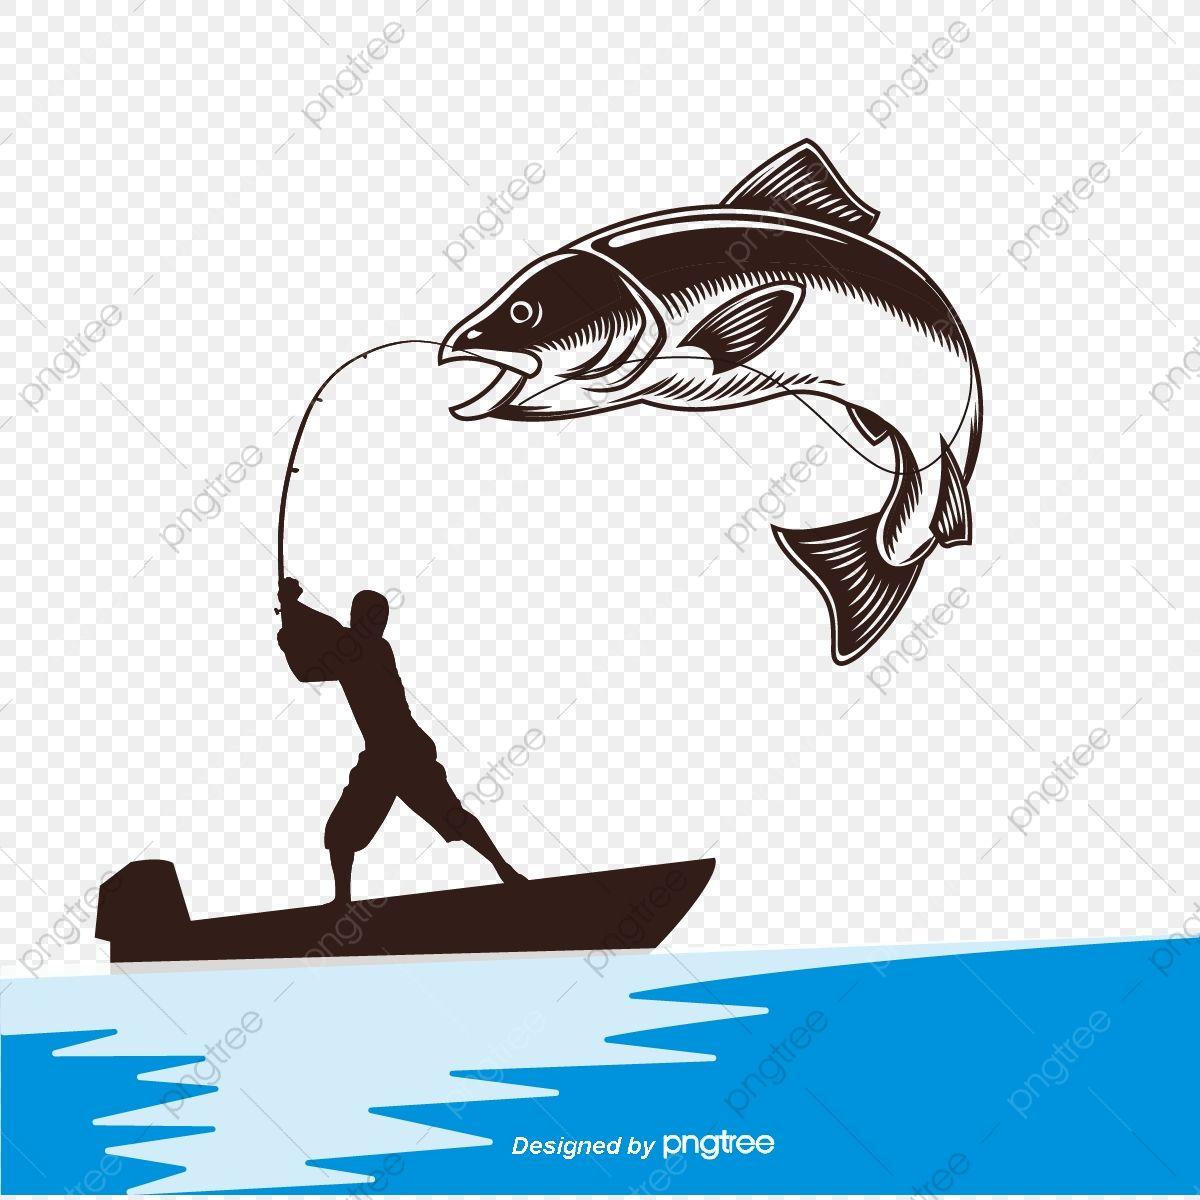 Fishing Industry Fishing Rod Fishing Boat Boat Vector Boat Clipart Fishing Boat Png And Vector With Transparent Backg In 2020 Boat Vector Fish Silhouette Drawn Fish